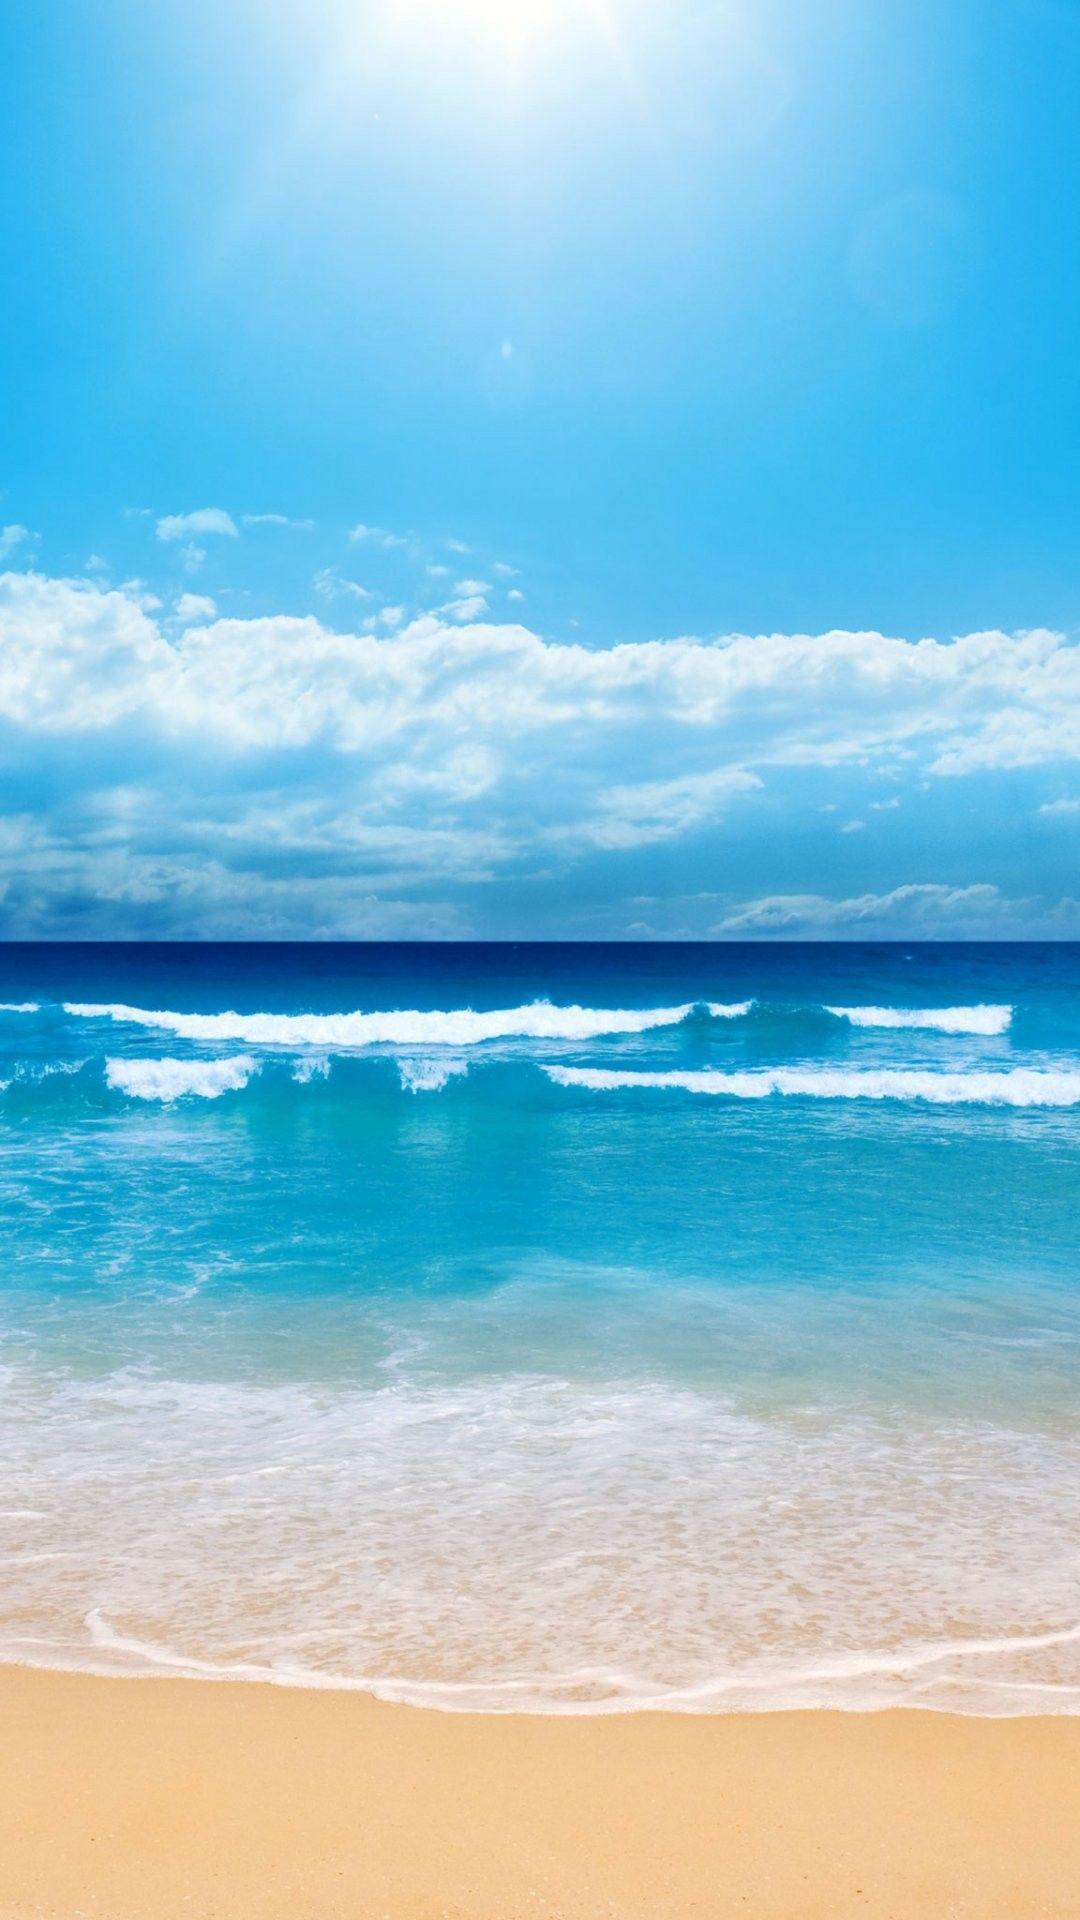 Hey Have You Heard Of Nature Iphone 6 Plus Wallpaper Trend In 2014 Fashion Blog Papel De Parede Praia Cenas De Praia Ondas Do Mar